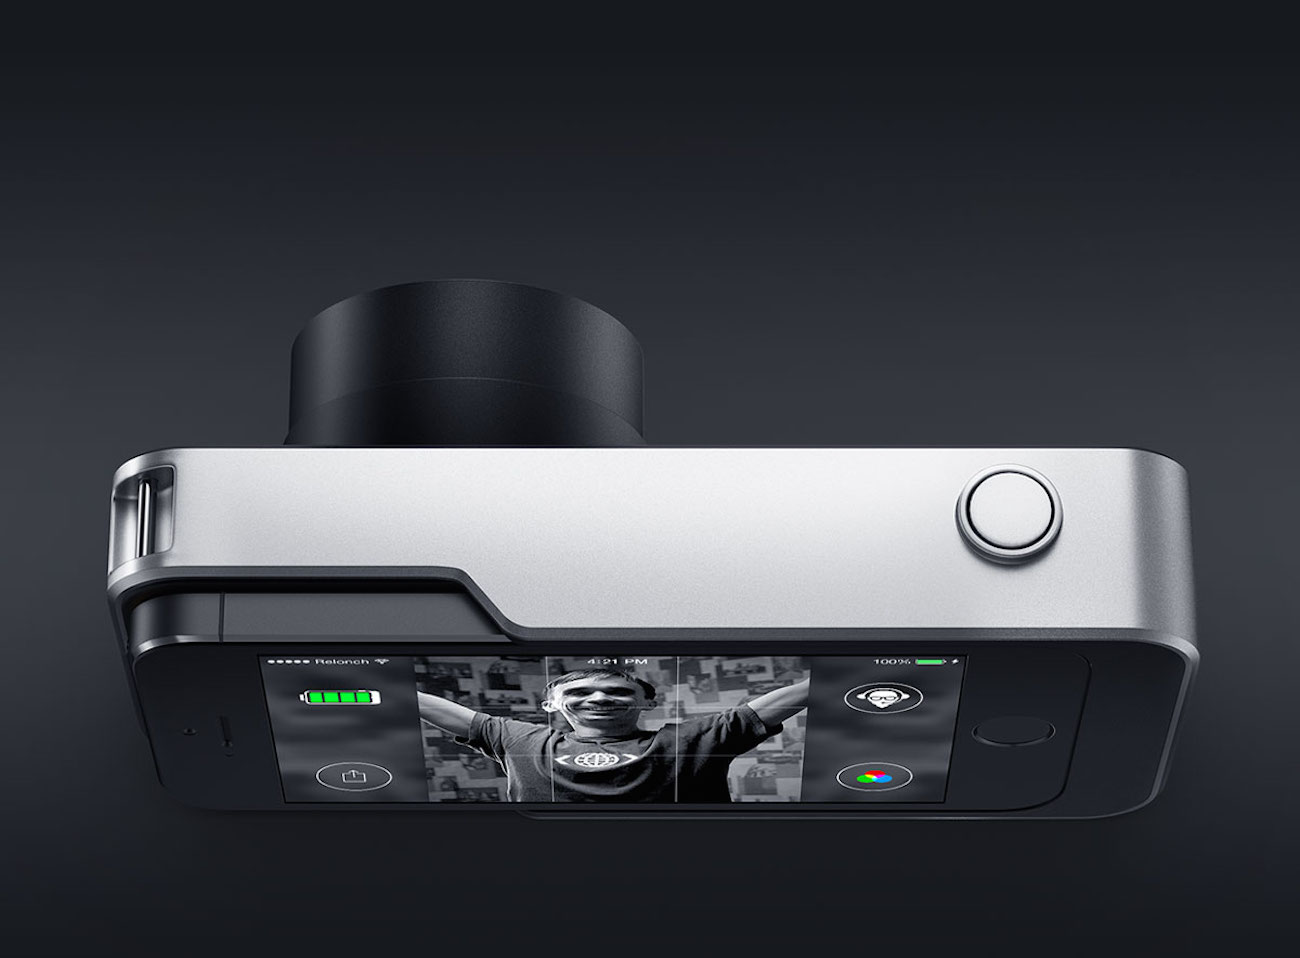 relonch-camera-02